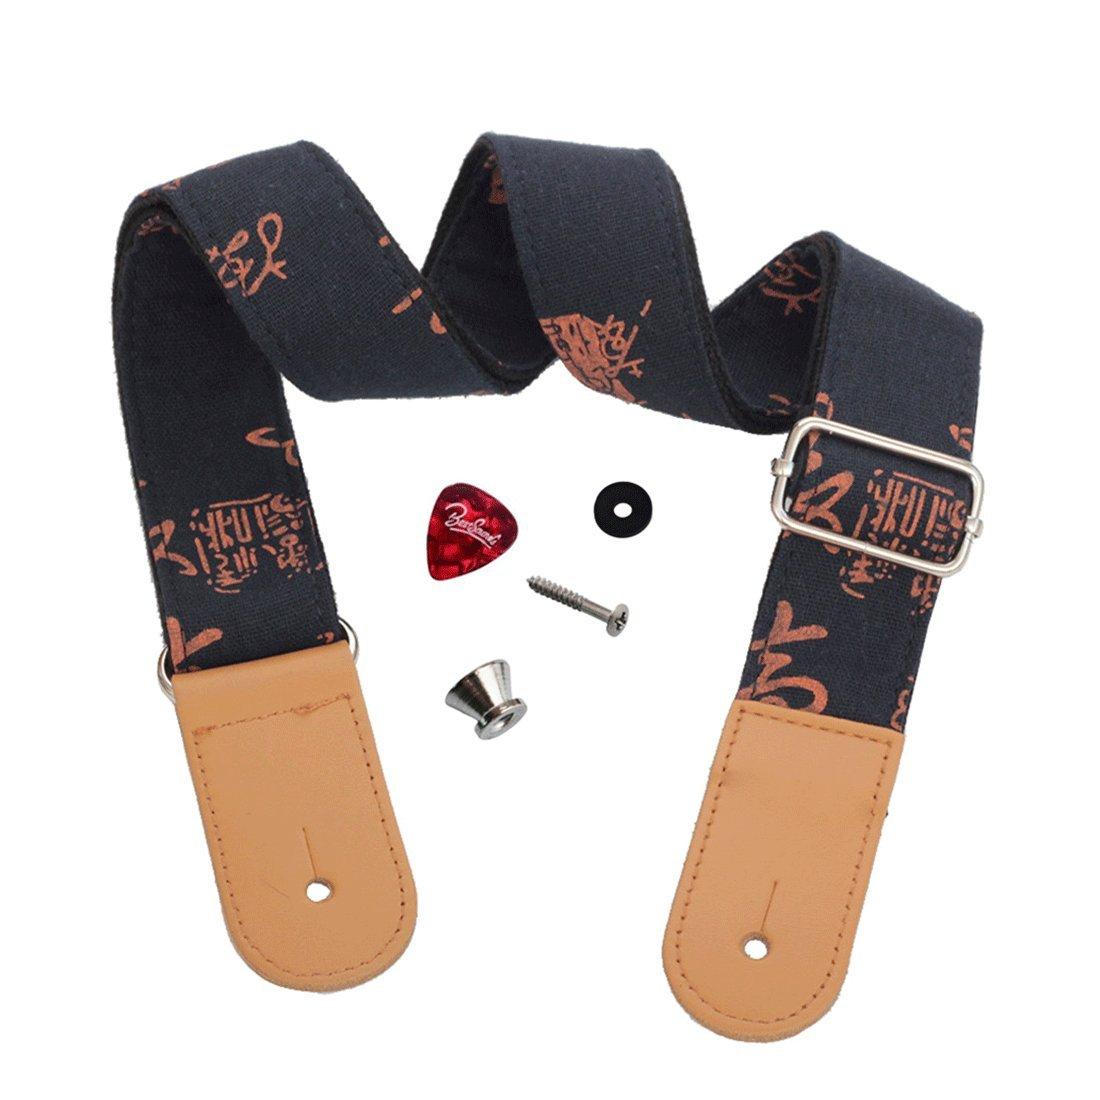 Dulphee Musicals Ukulele Strap Country Style Soft Cotton Linen, Adjustable Ukulele Strap-Genuine Leather Ukulele Shoulder Strap, 1 Picks (LightGray) US-12